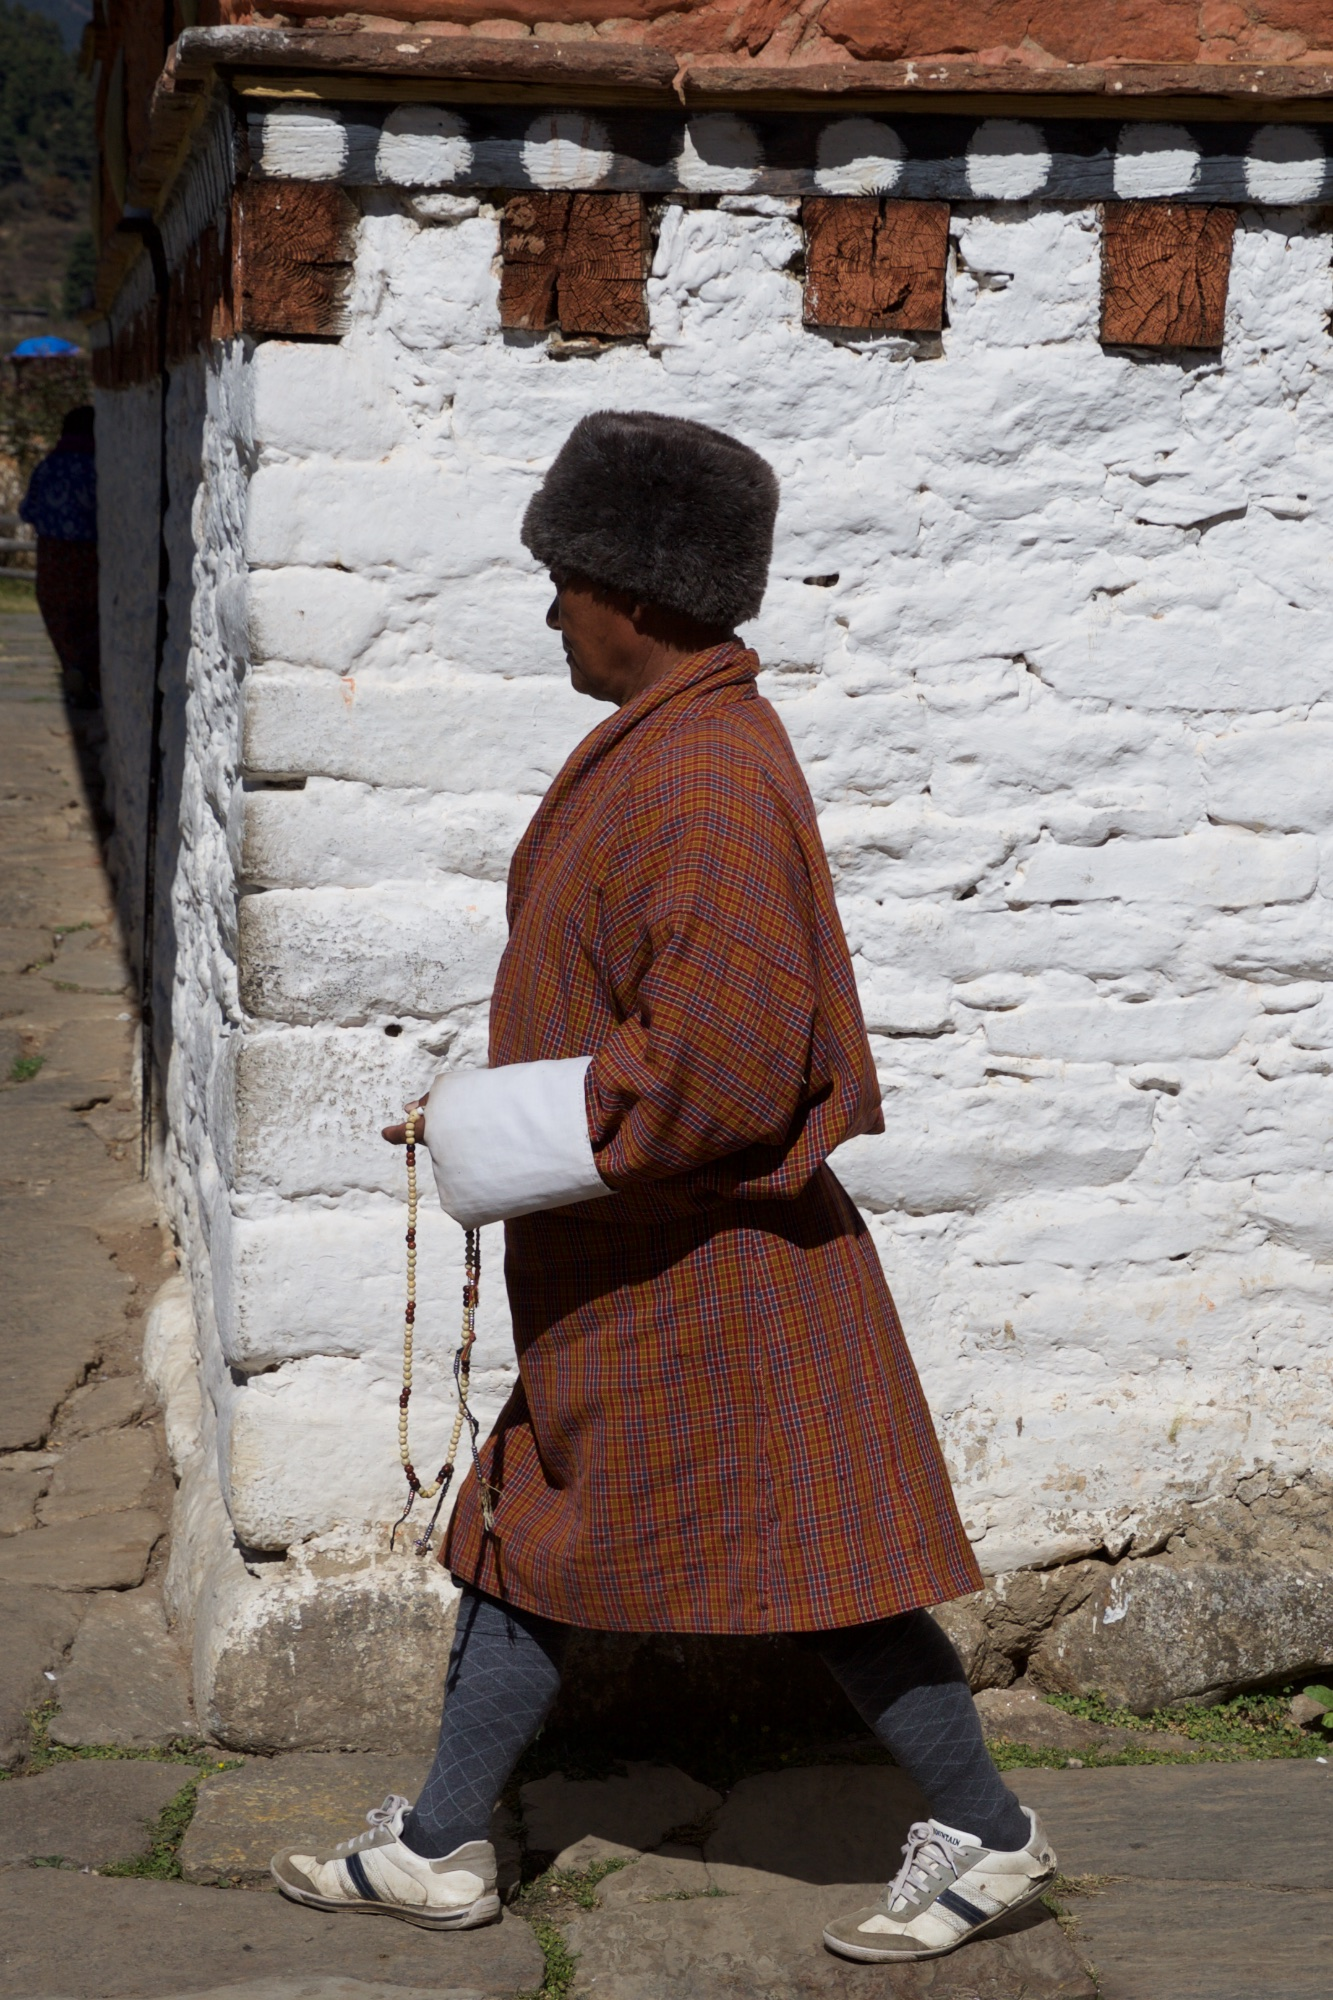 Bhutan-2016- C26O8199.jpg